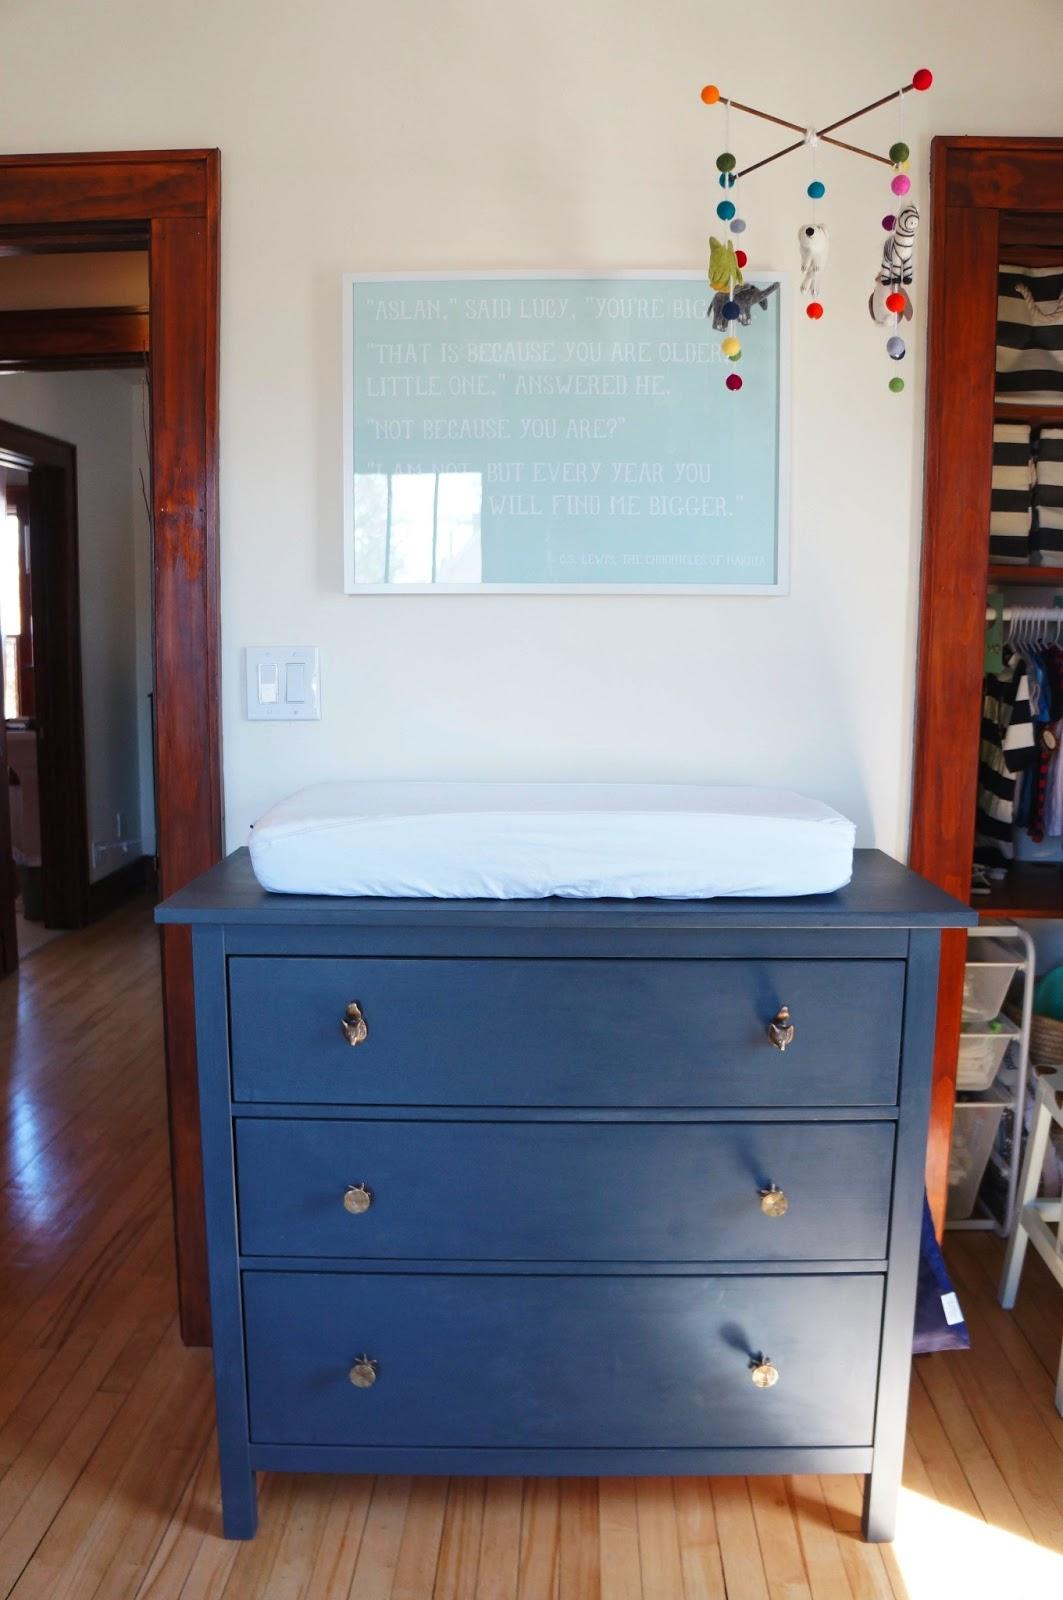 Hemnes Dresser Hack. Ikea Hack For Our Hemnes Dresser That We Love ...